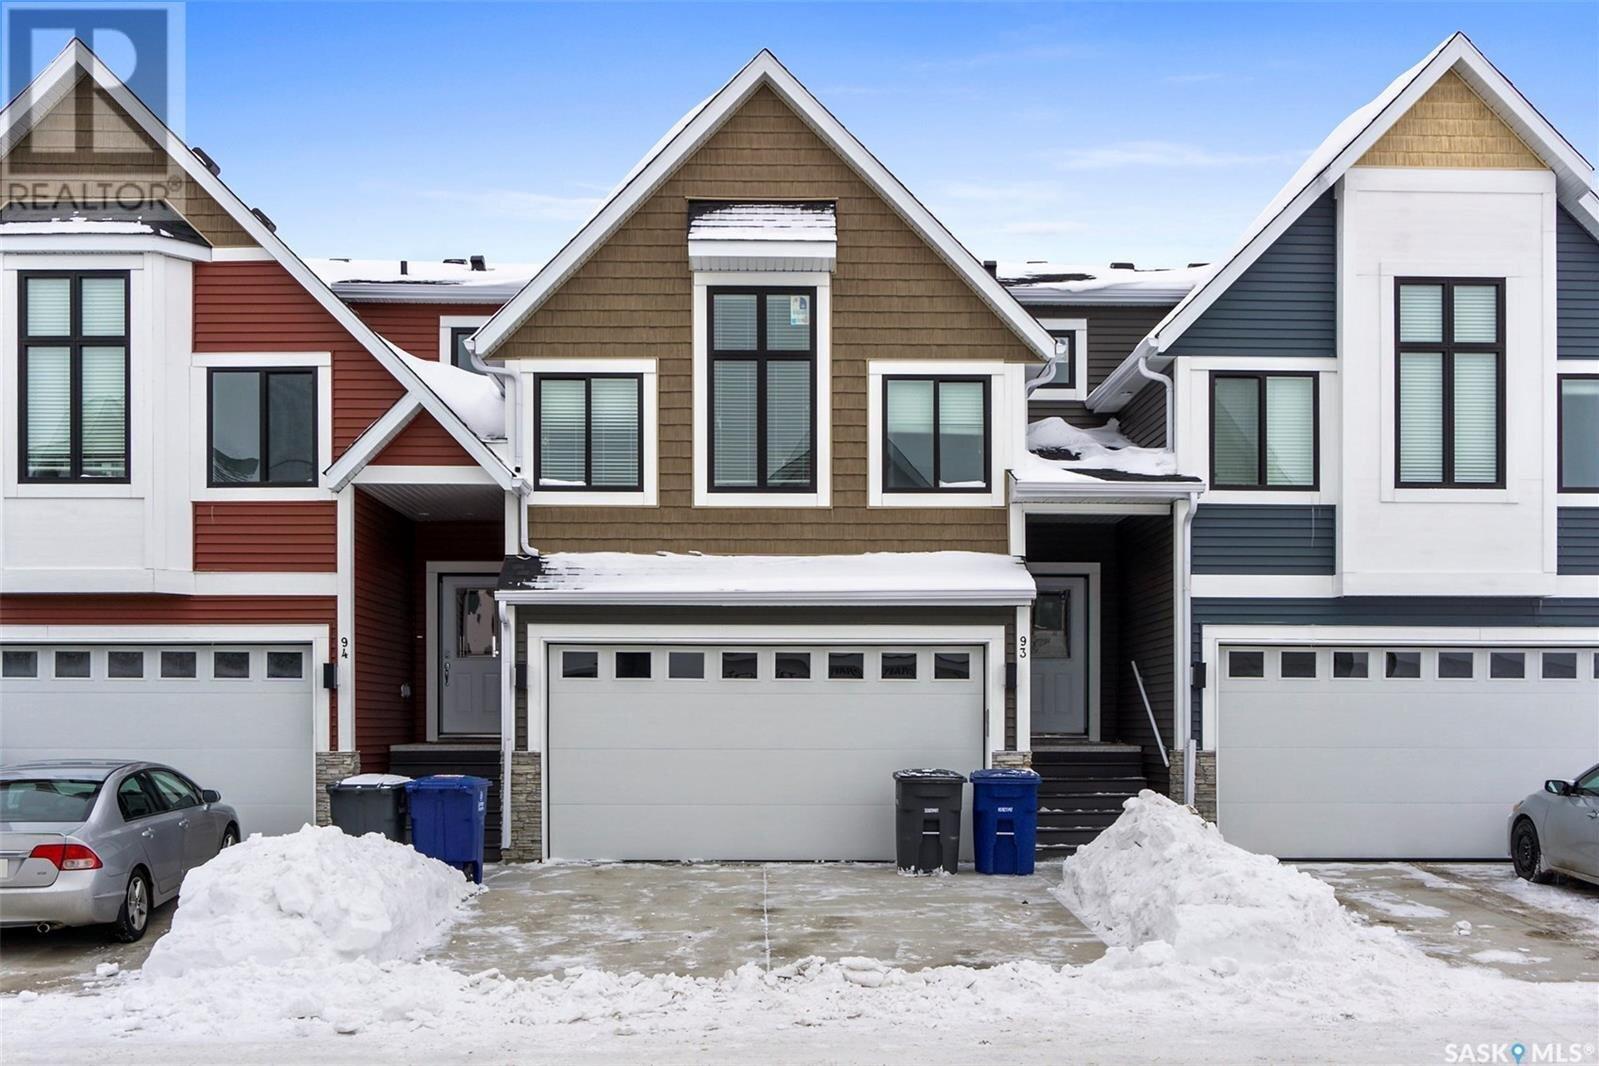 Townhouse for sale at 900 St Andrews Ln Unit 93 Warman Saskatchewan - MLS: SK830870